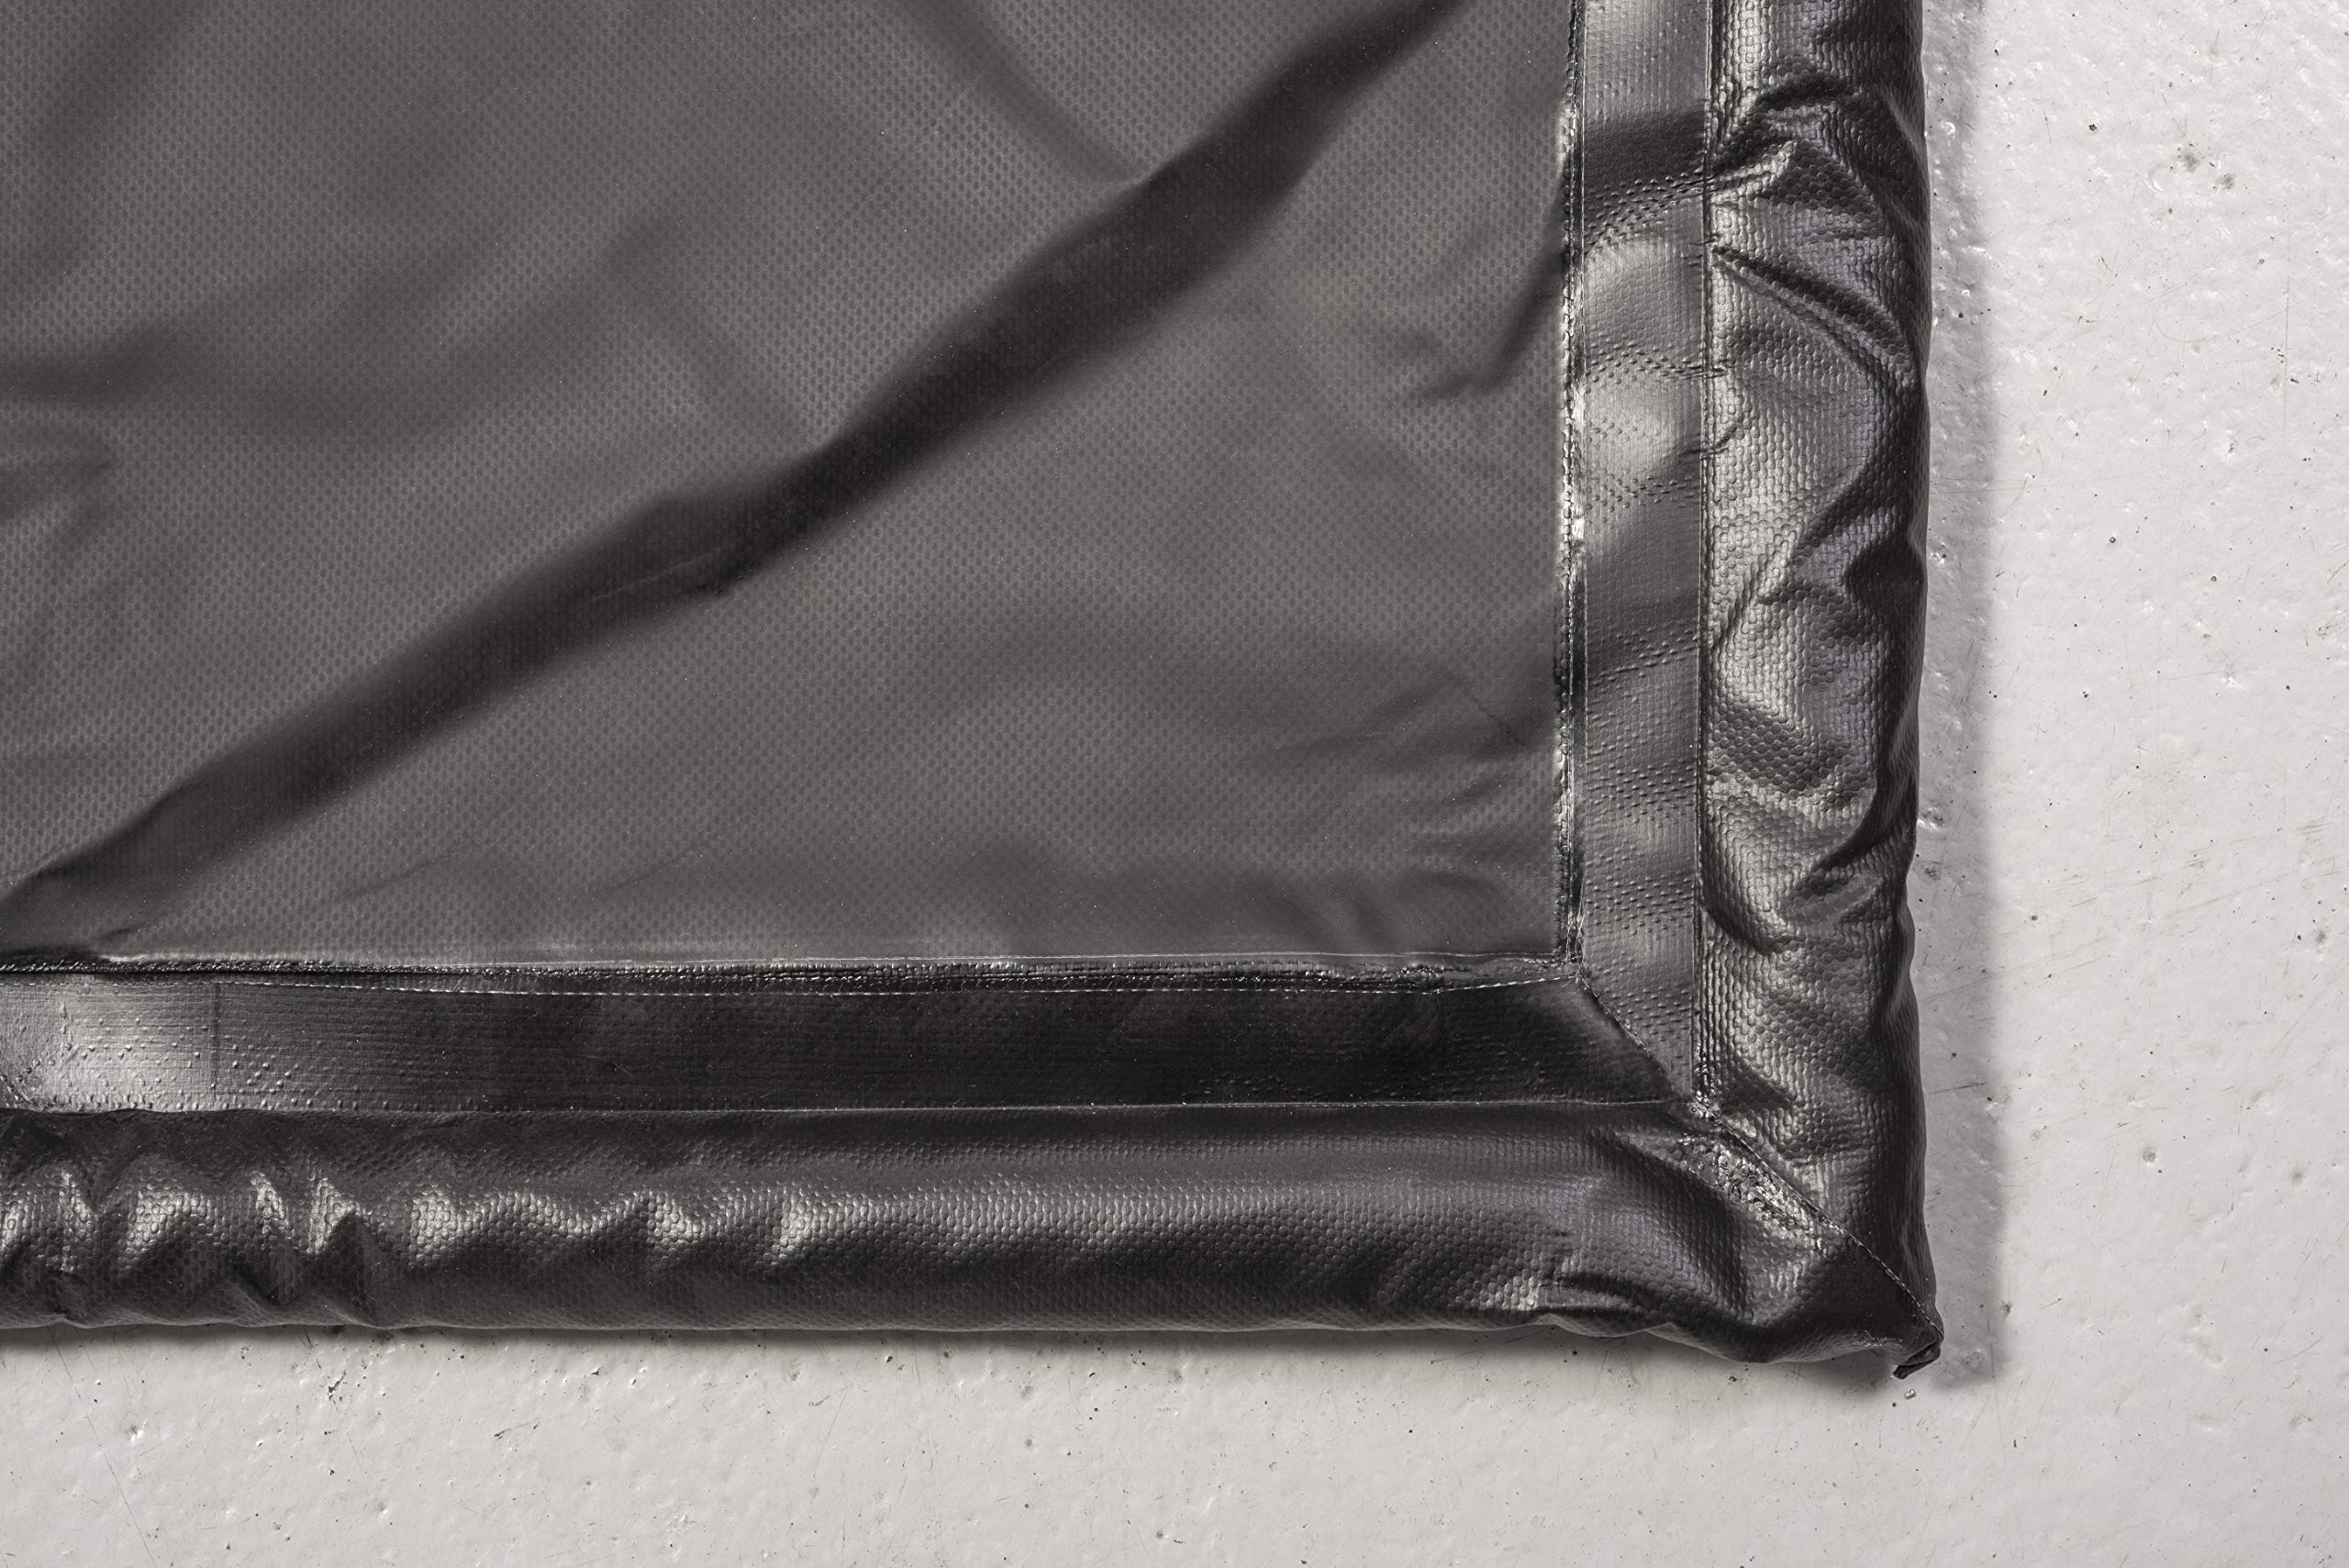 AutoFloorGuard AFGS-7916 Black 7'9'' x 16' AFG Compact Size Containment mat by AutoFloorGuard (Image #3)